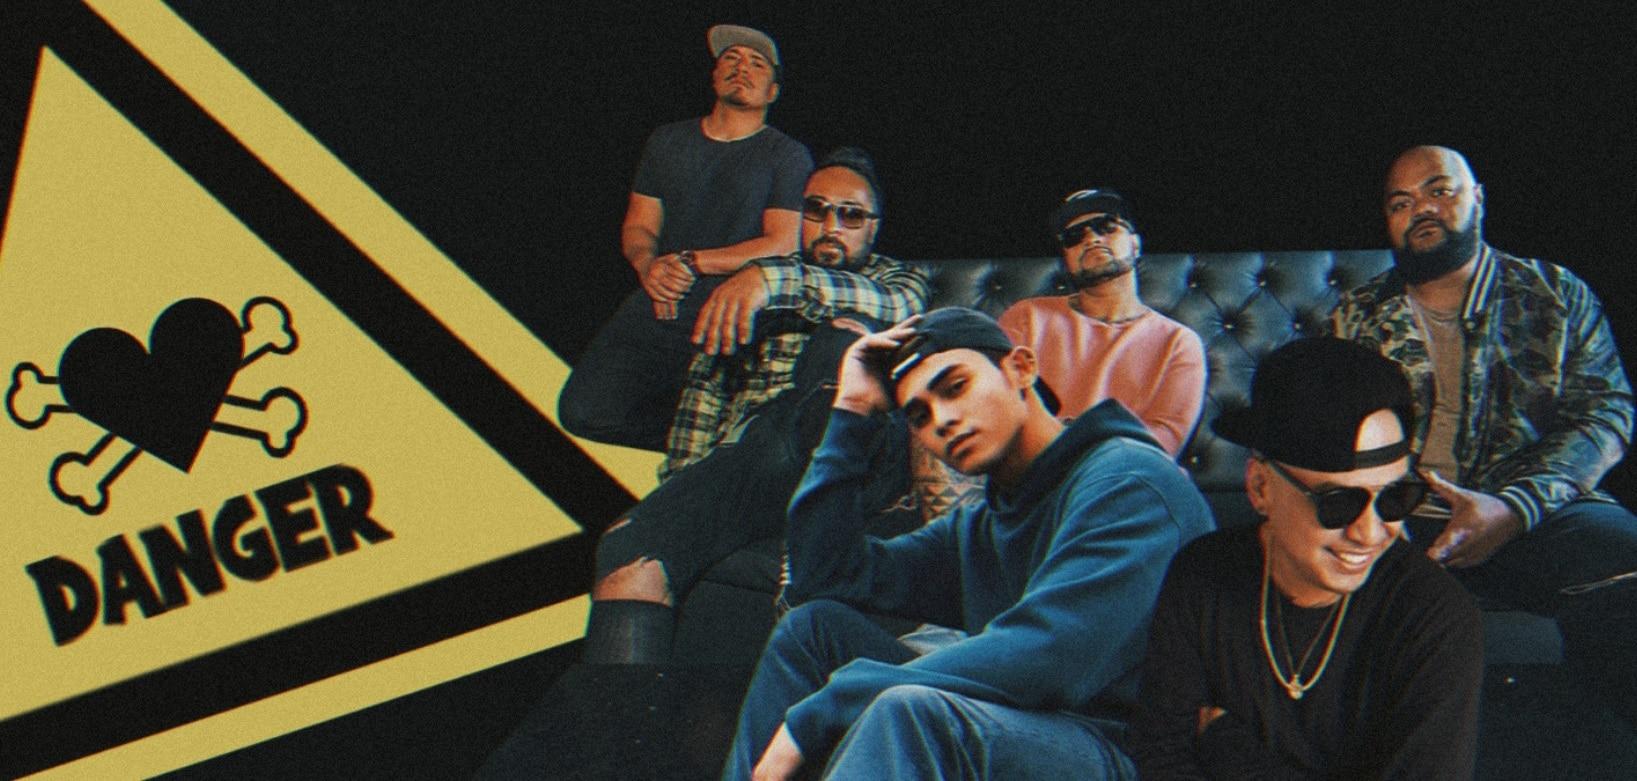 Danger_Inigo_CommonKings_DJFlict_US Radio (2)